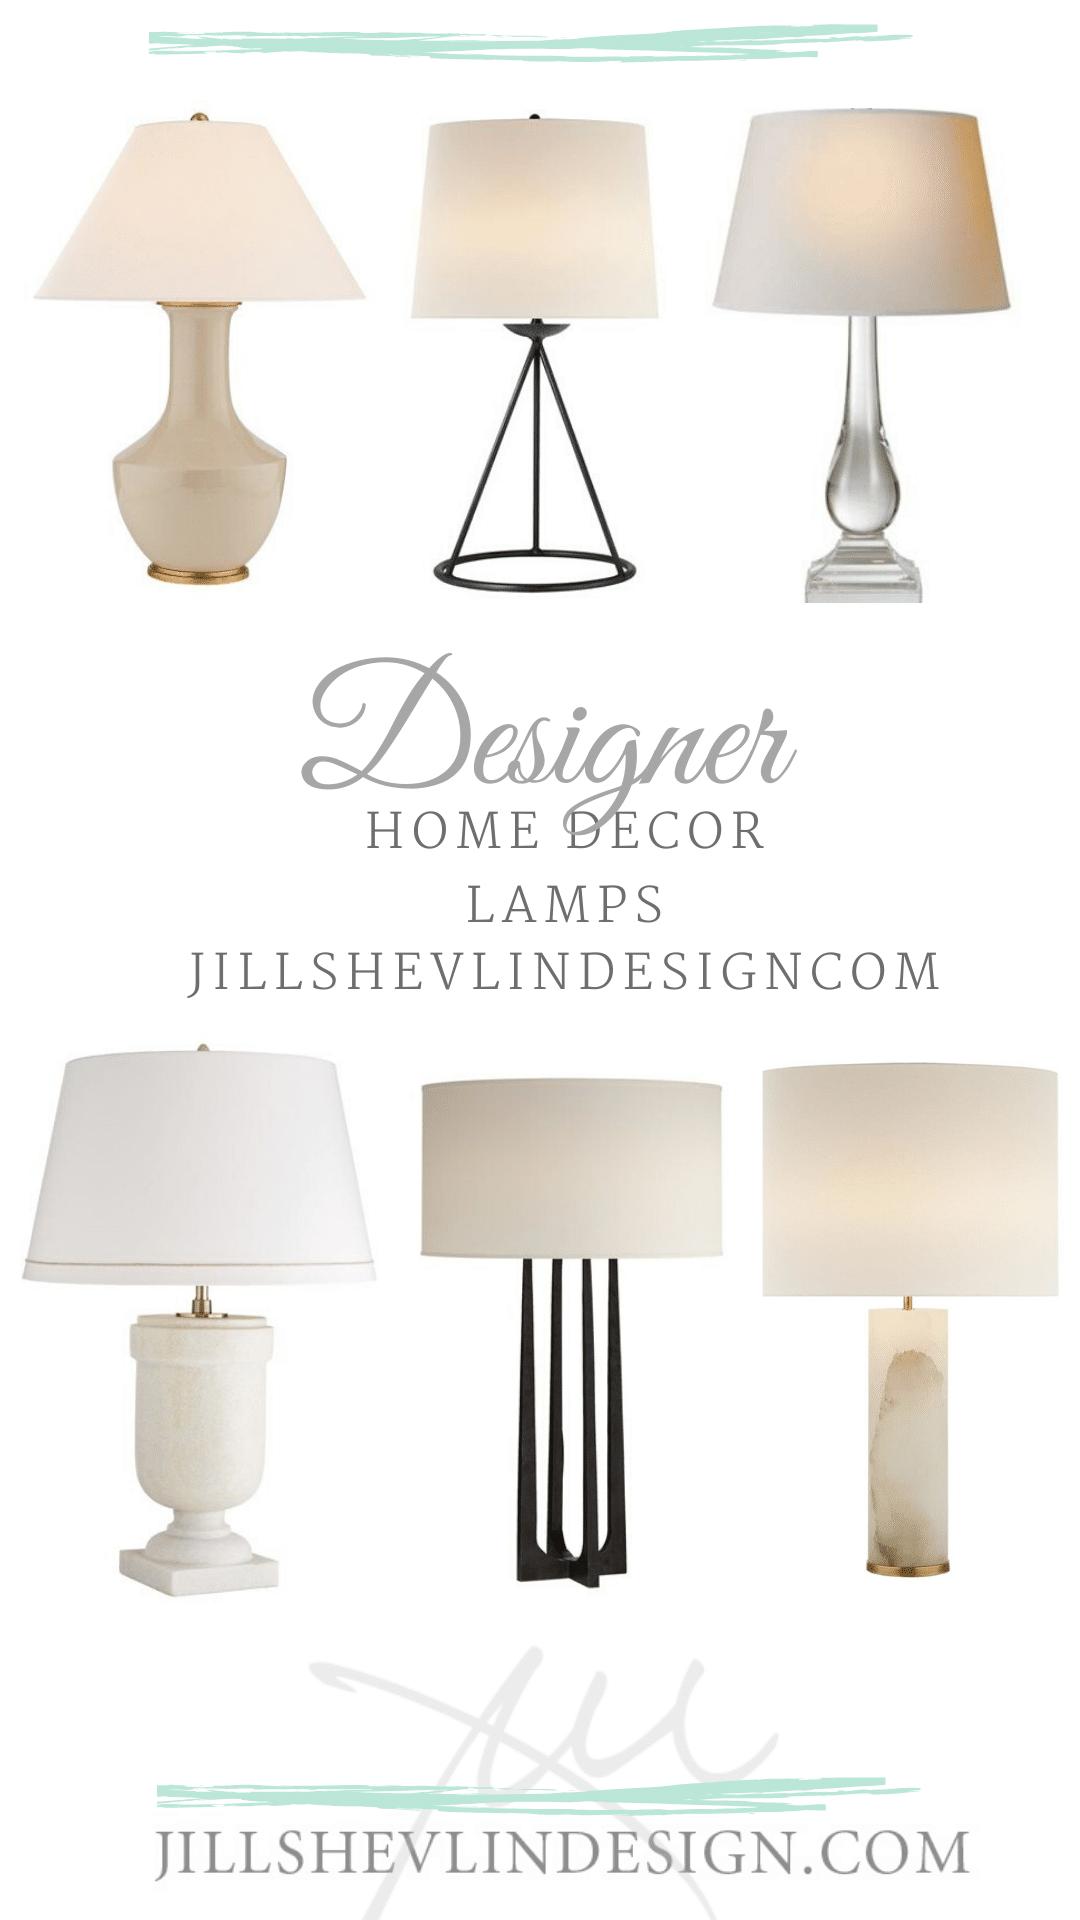 designer sourced lamps, interior designer jill shevlin vero beach designer lamps designer home decor